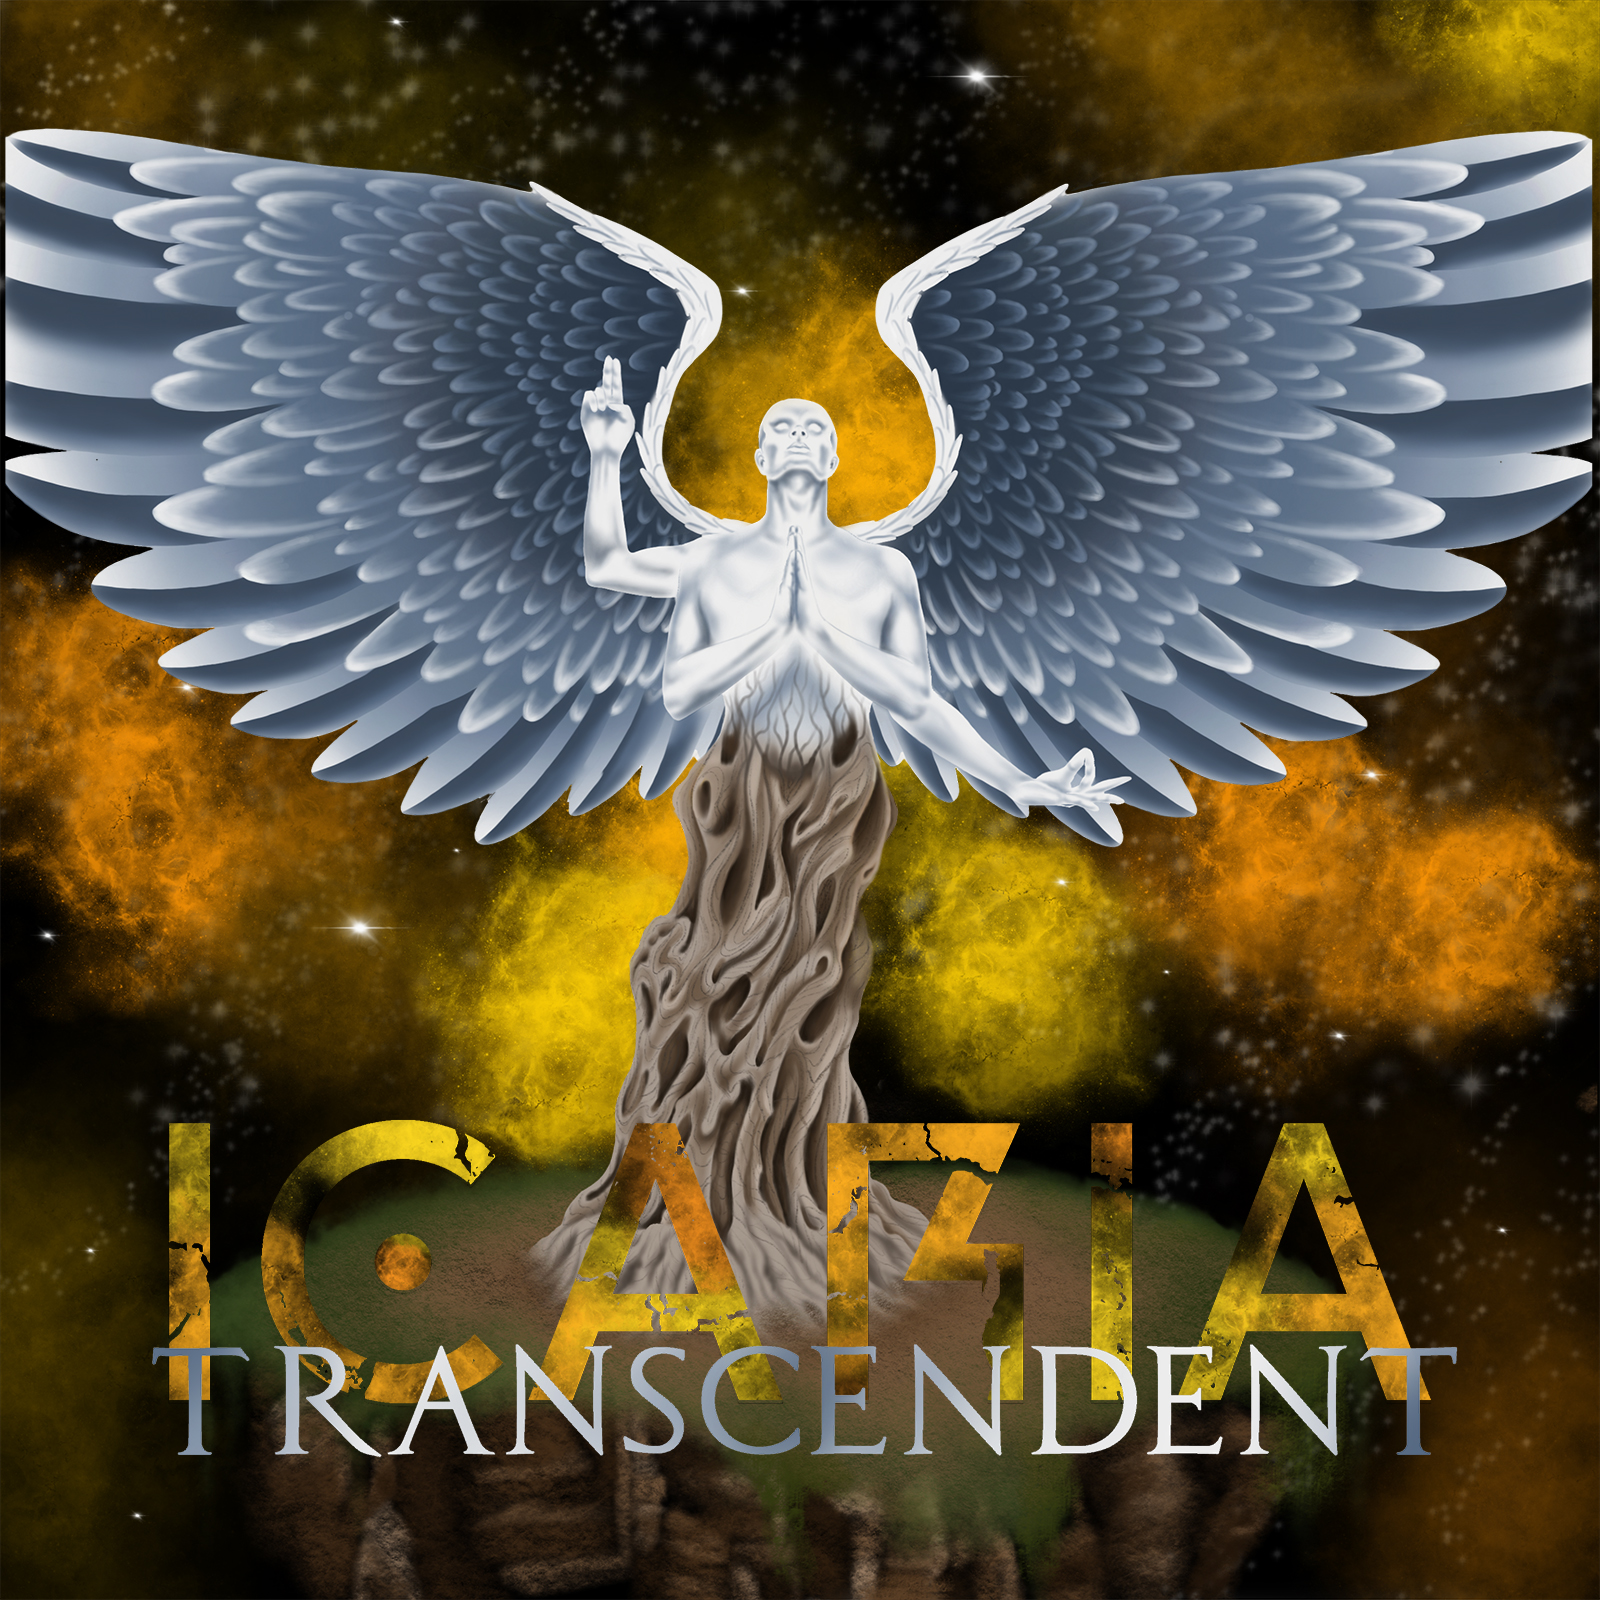 Top Five Transcendent - Circus